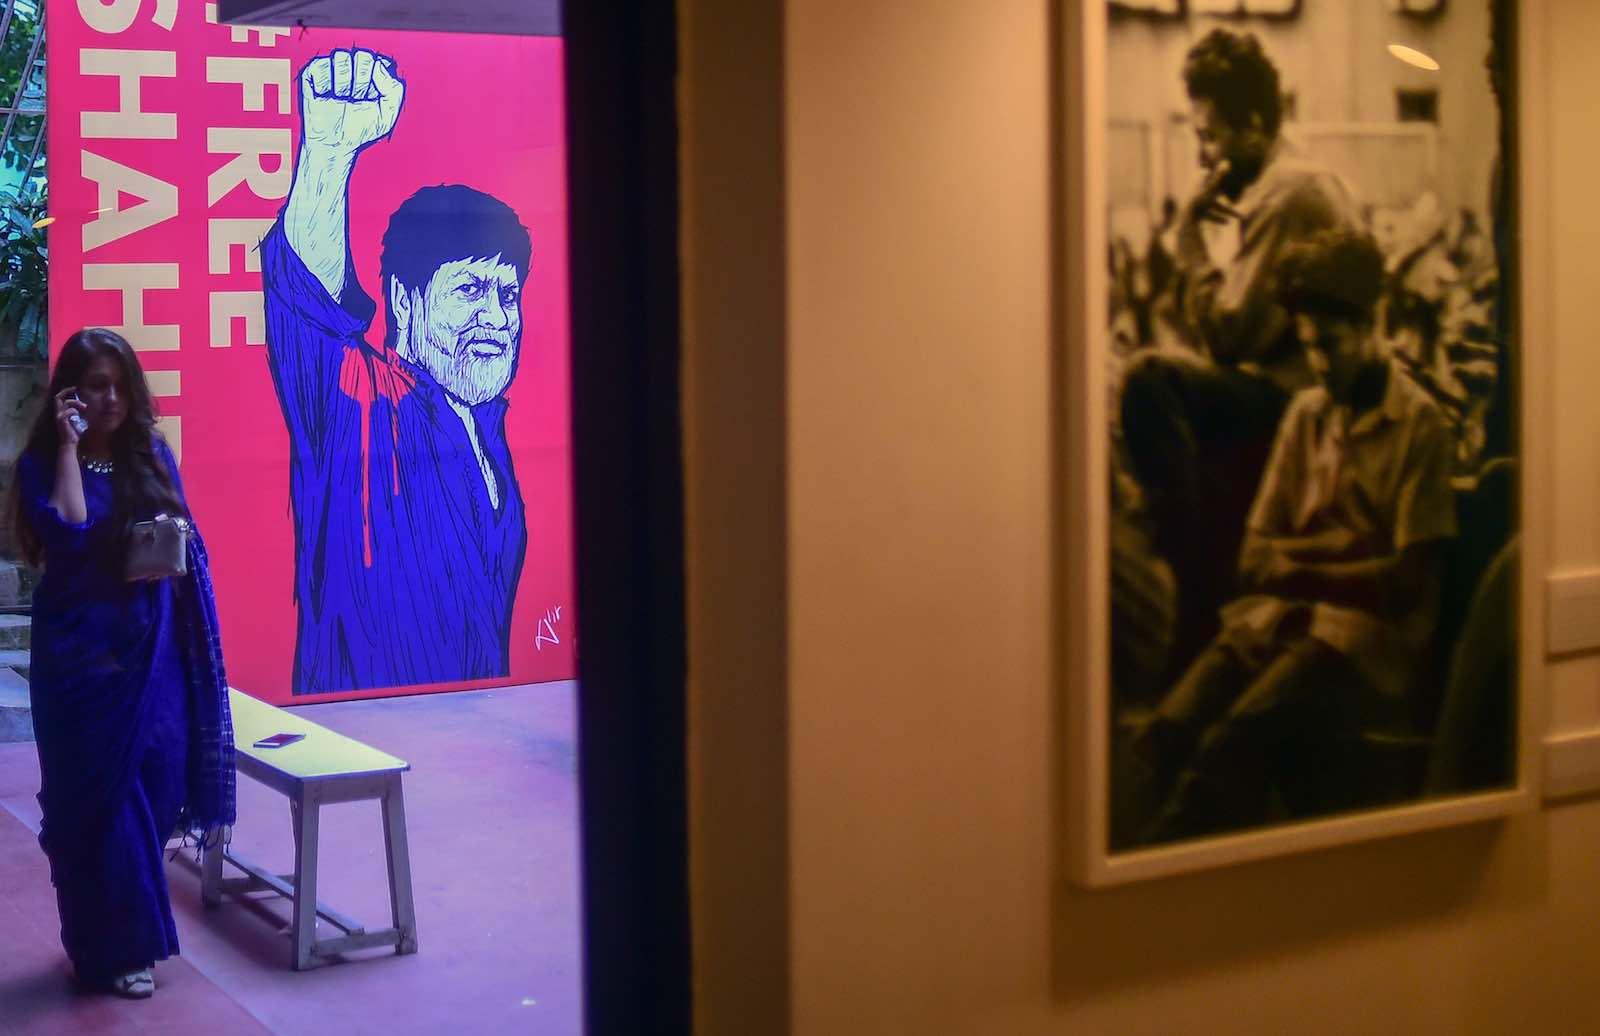 "An exhibition ""A Struggle for Democracy"" featuring photographs by imprisoned photojournalist Shahidul Alam in Dhaka, 10 September 2018 (Photo: Munir Uz Zaman via Getty)"